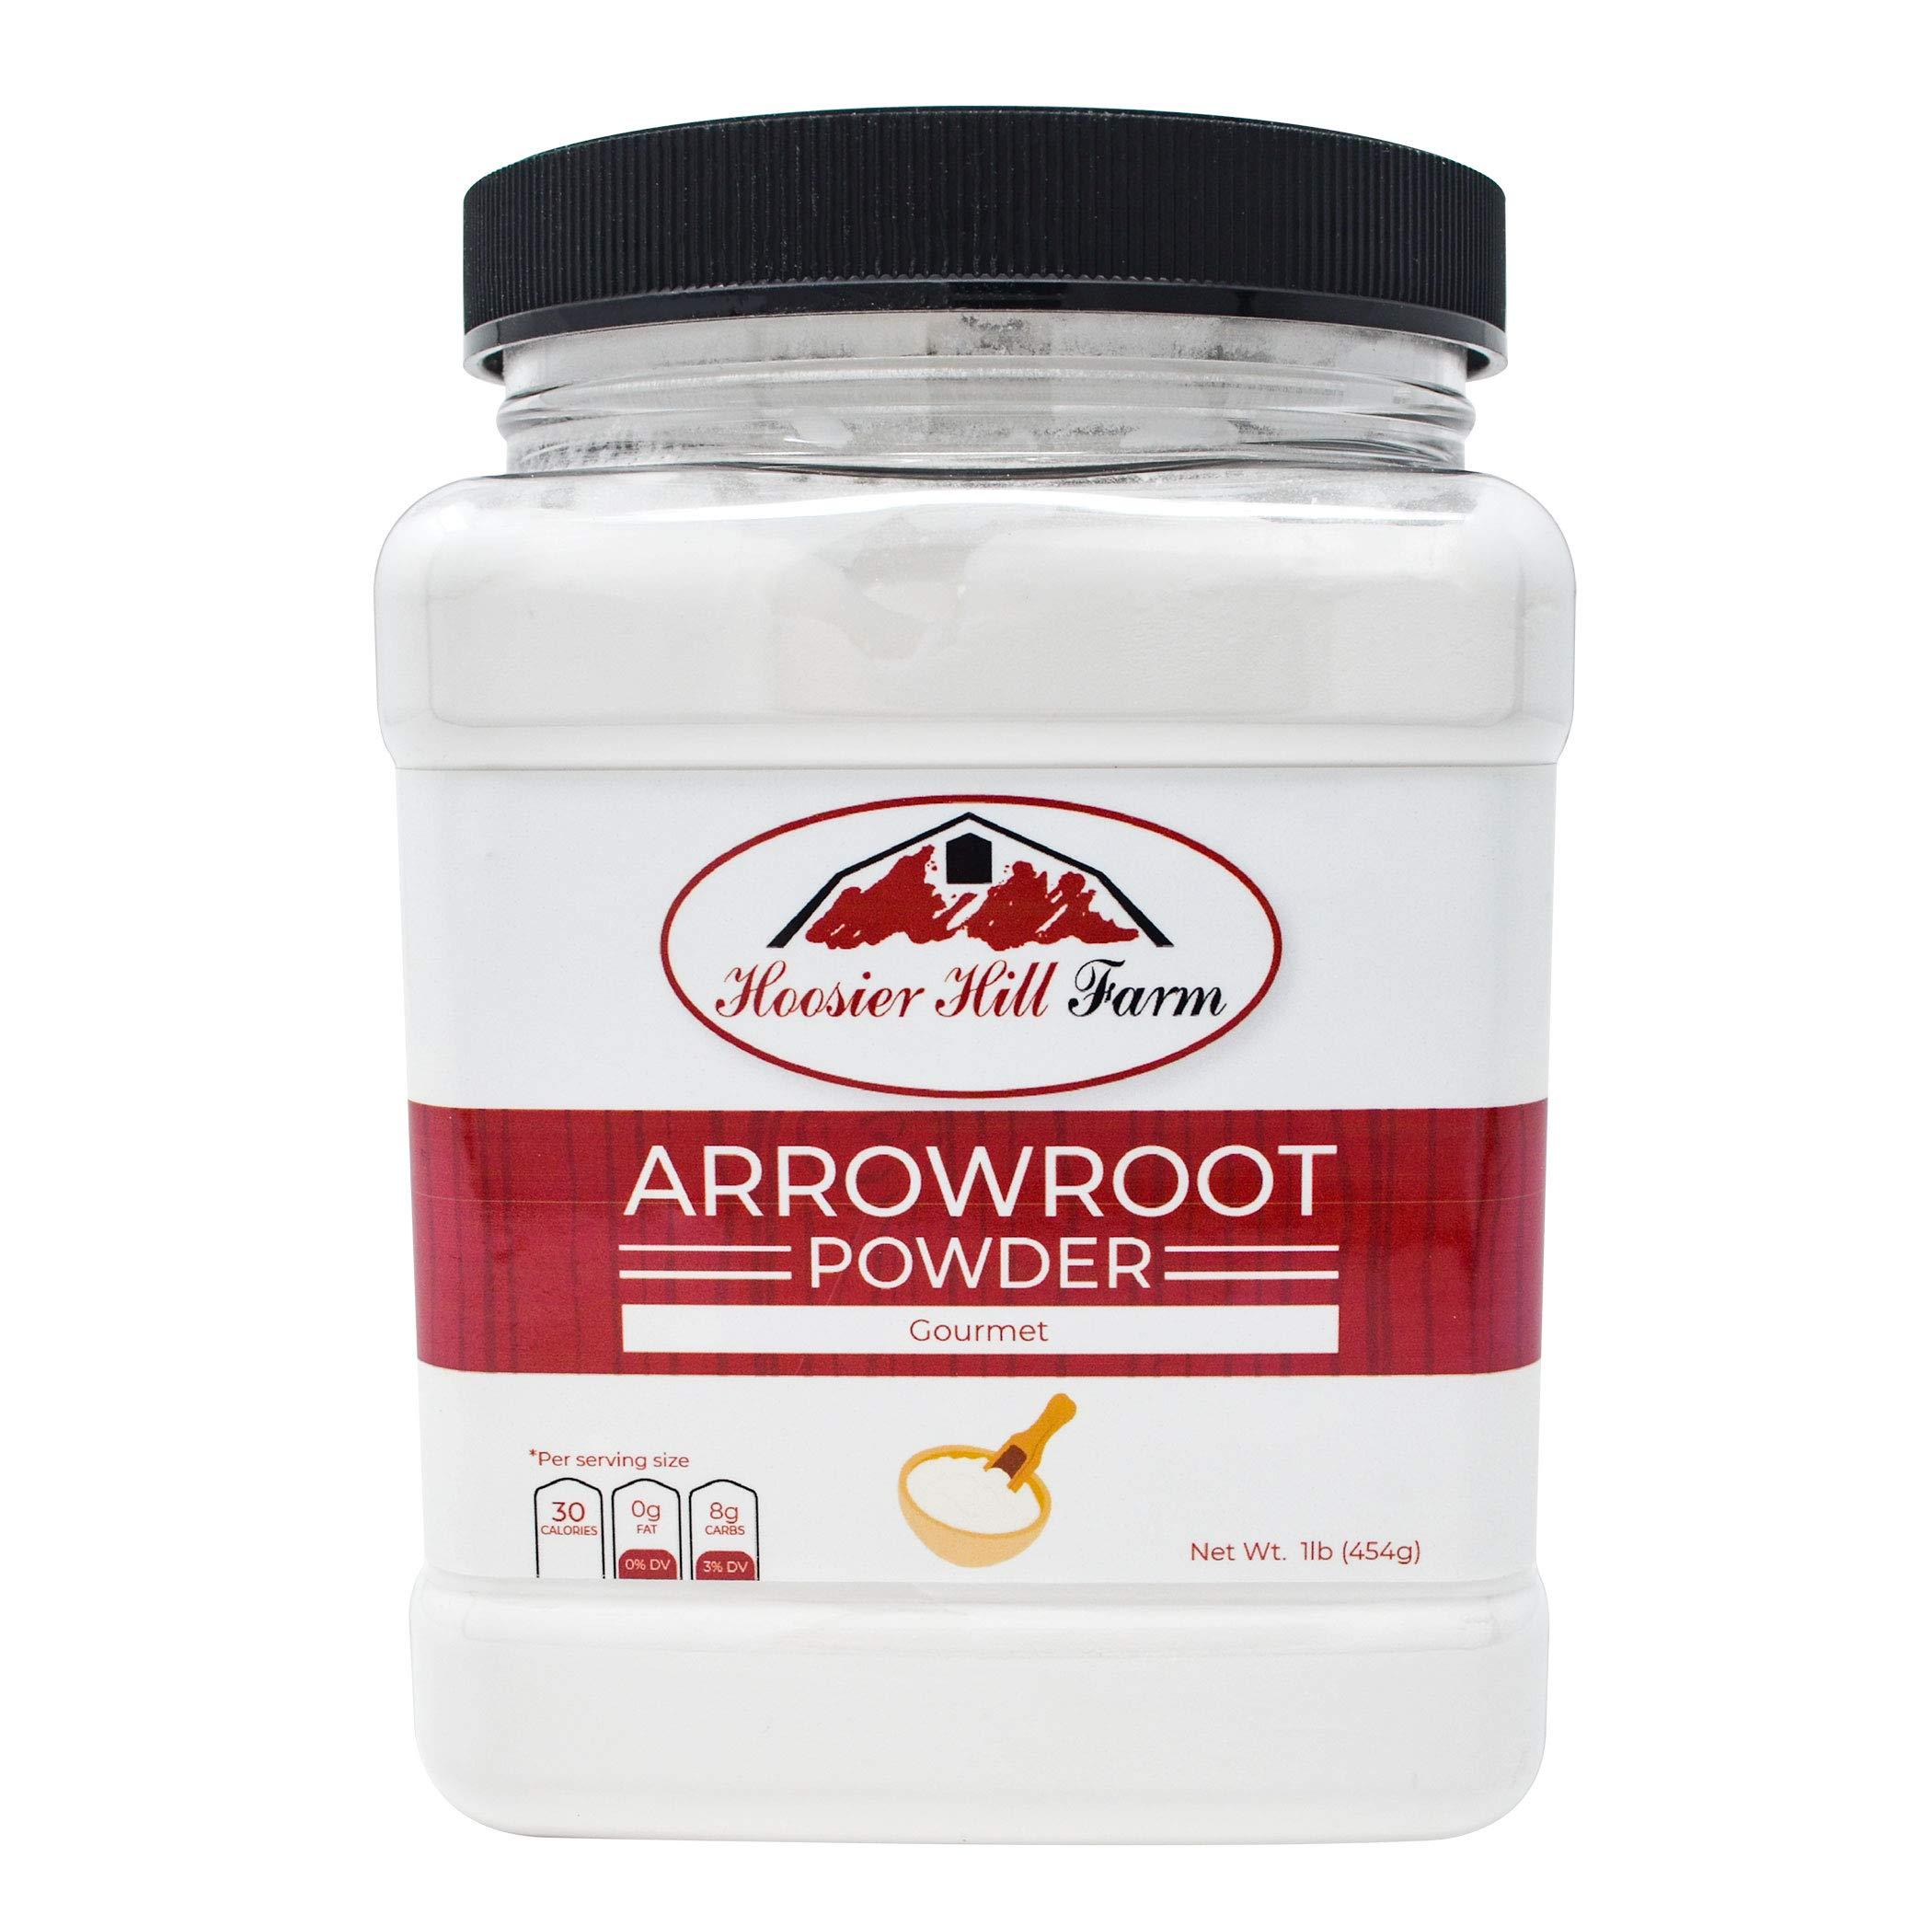 Hoosier hill farm premium arrowroot powder 1 lb